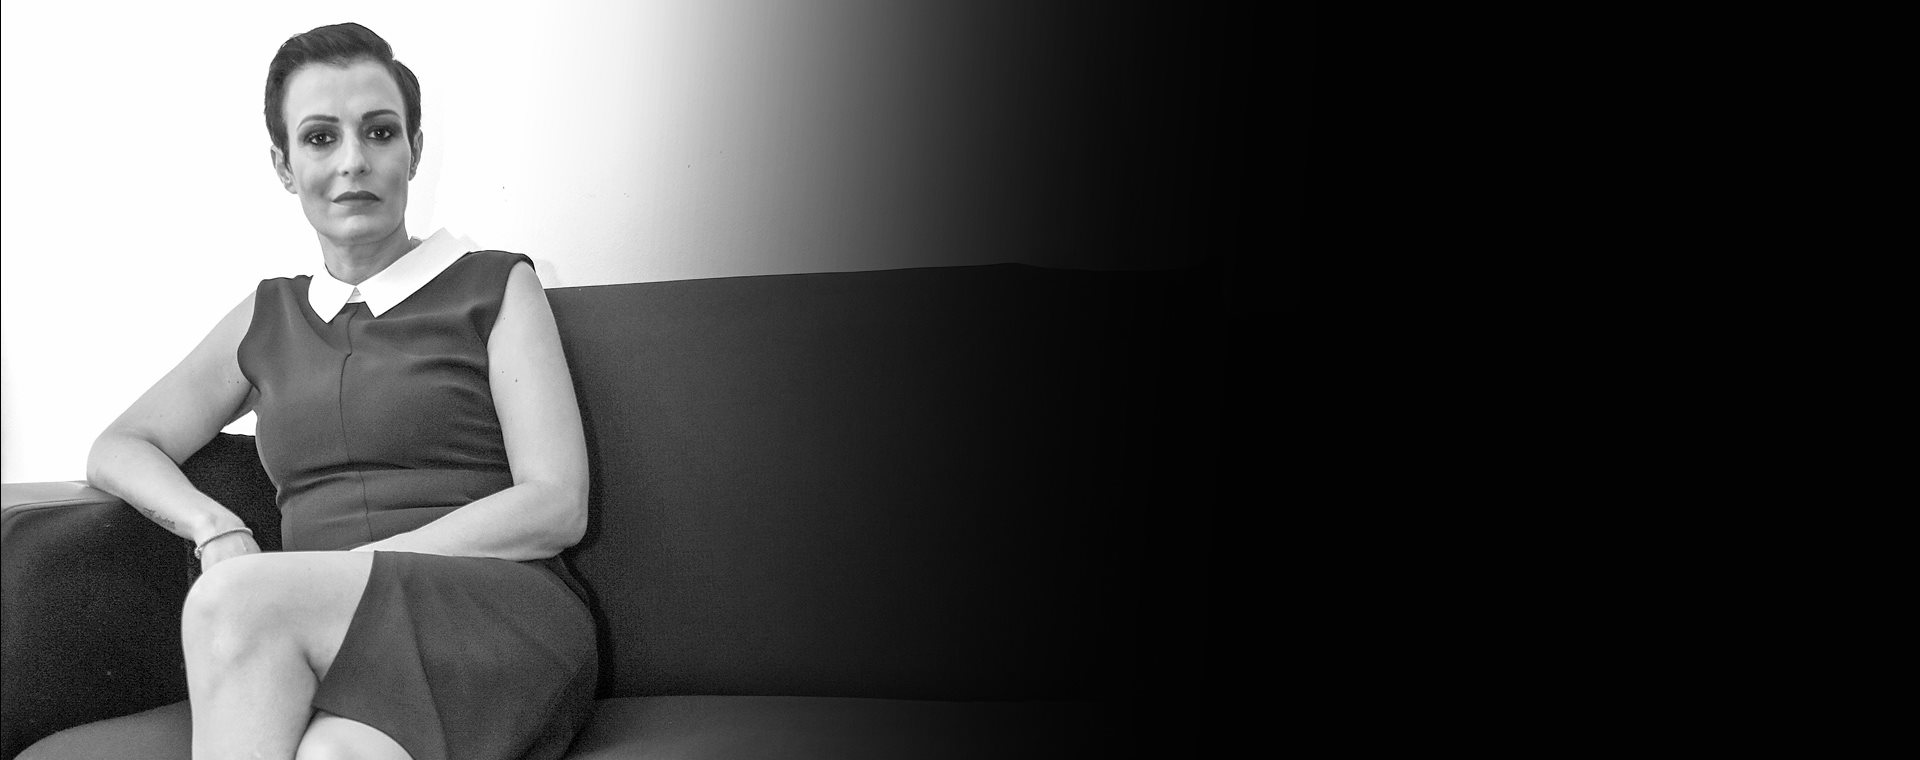 Single γονέα που χρονολογείται μετά το διαζύγιο